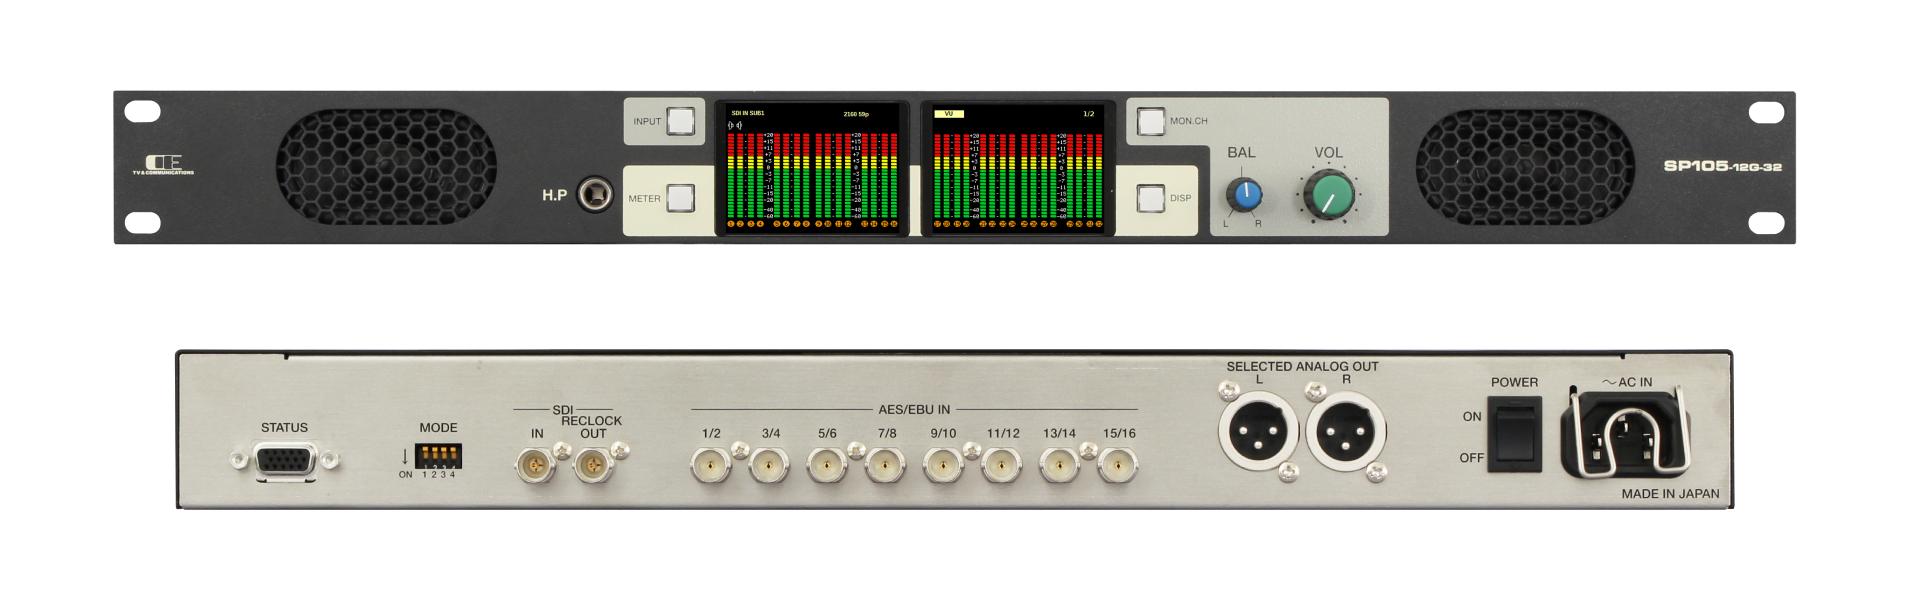 SP105-12G_panel_image